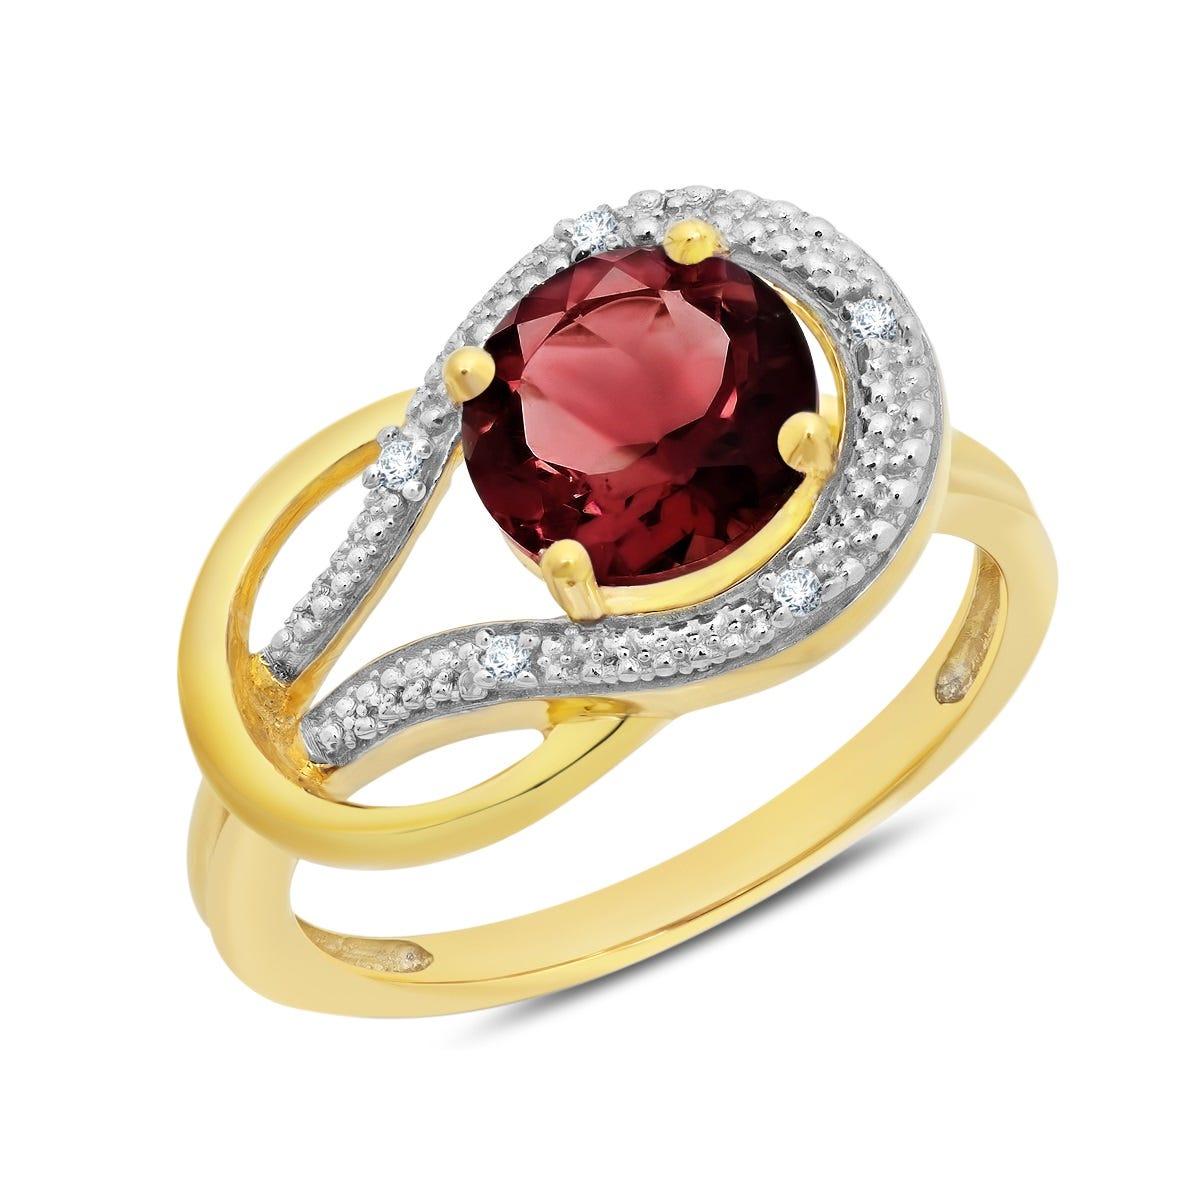 Garnet & Diamond Love Knot Ring in 10k Yellow Gold